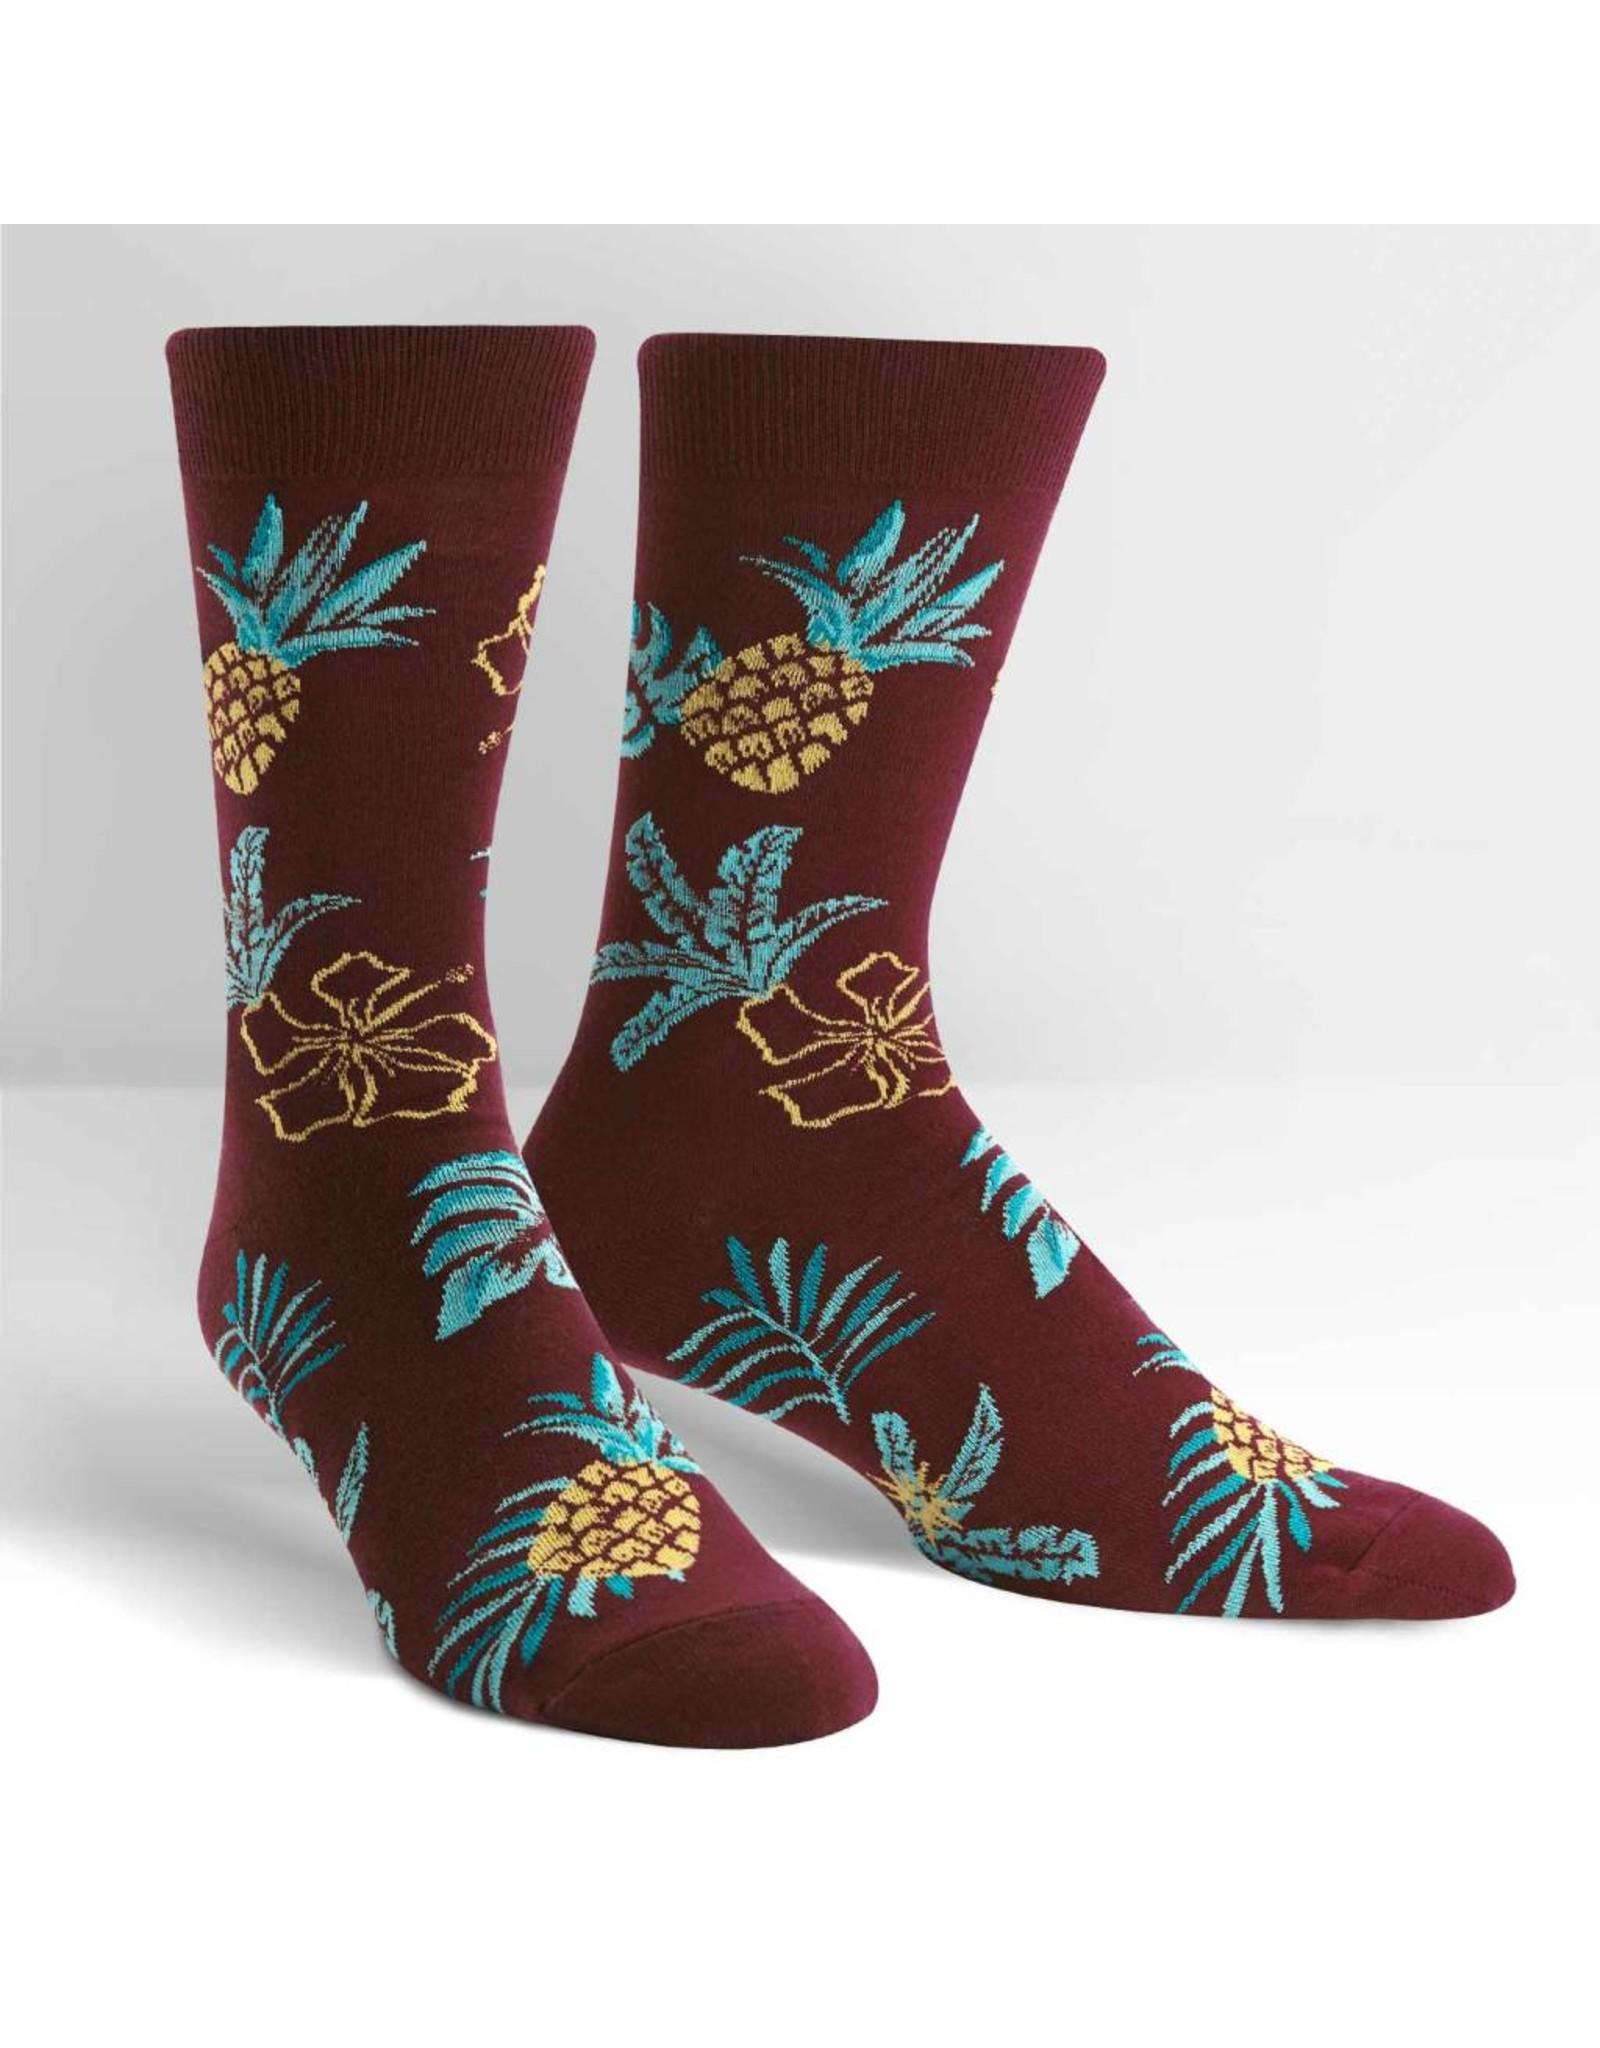 SOCK IT TO ME - Men's Hawaiian Sock Day Crew Socks